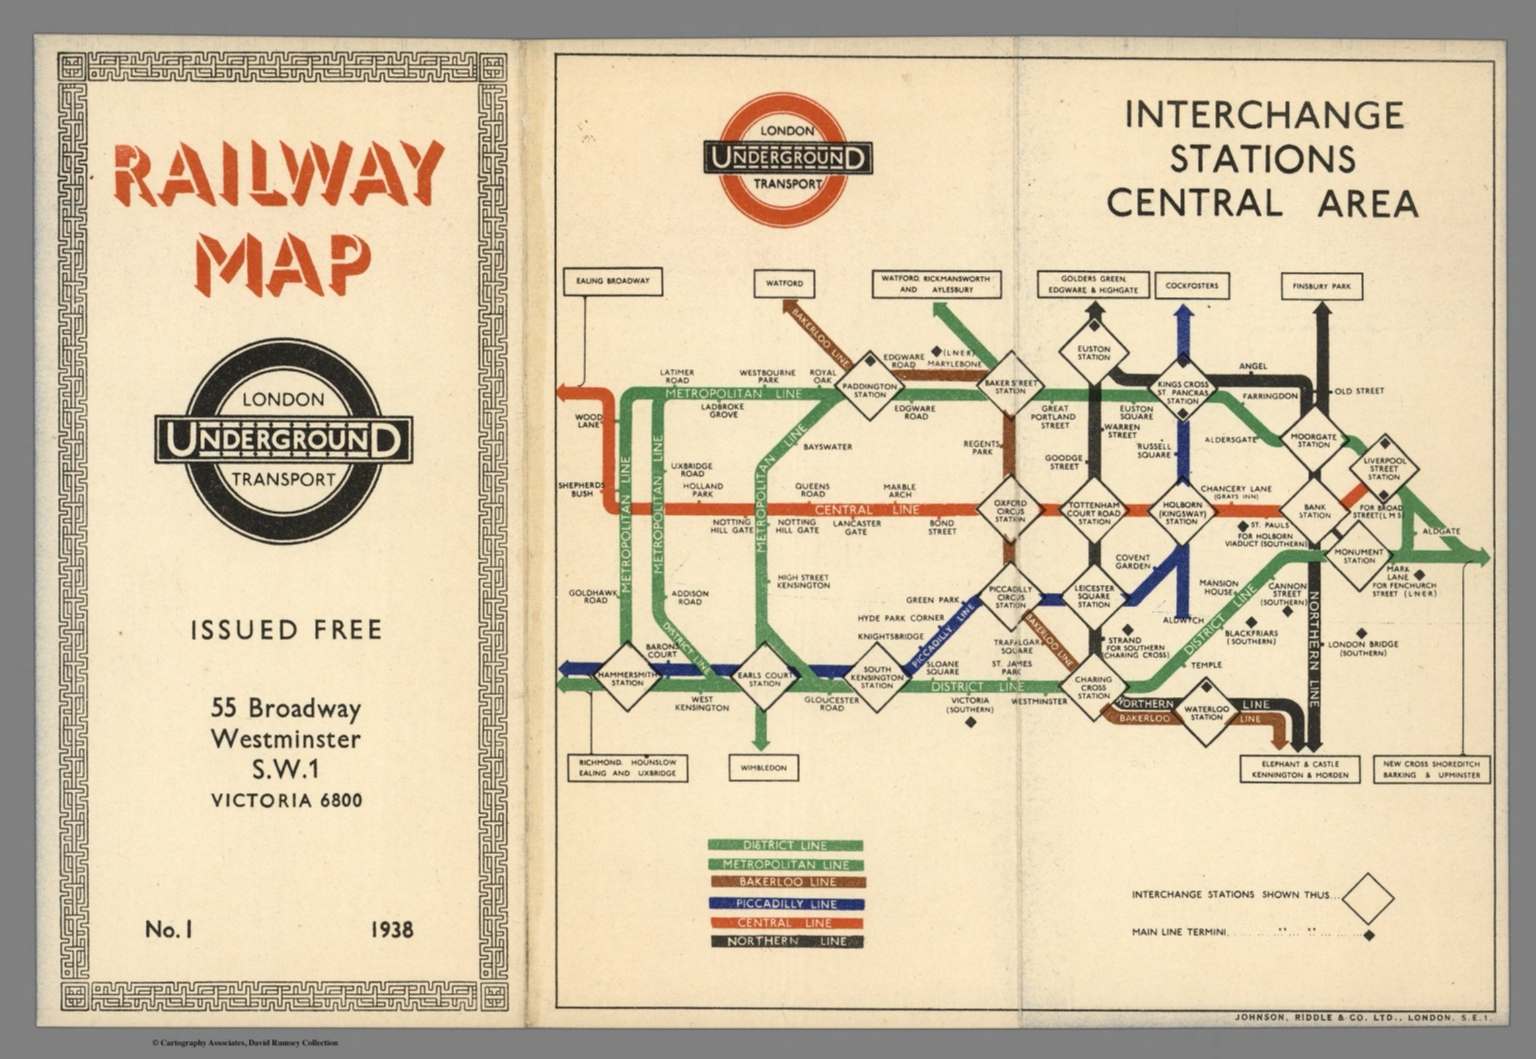 railway map london underground transport interchange stations central area